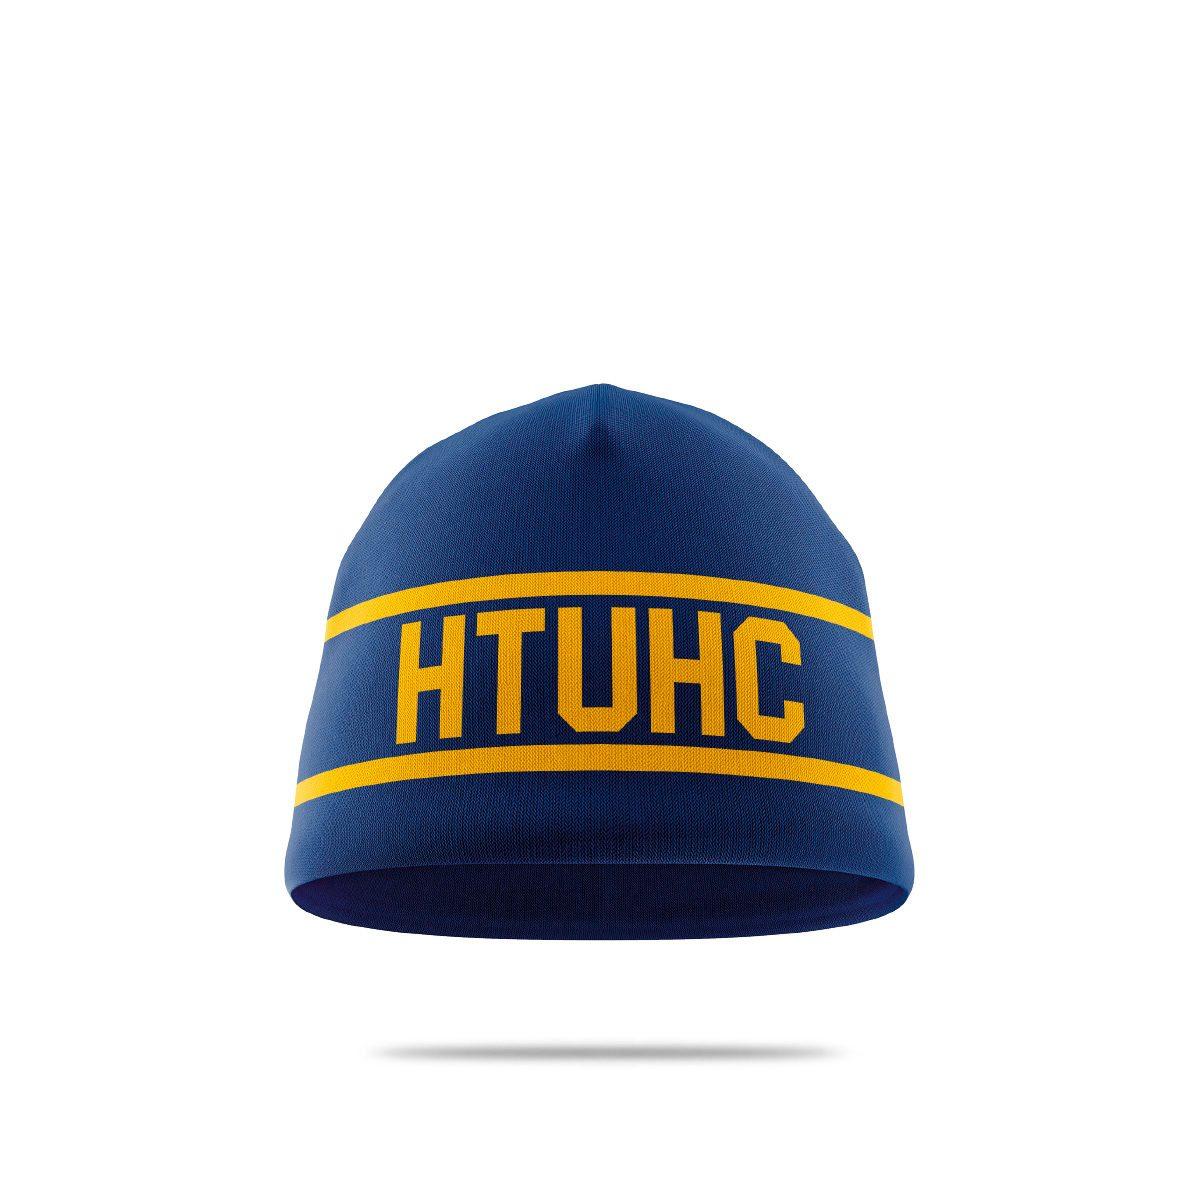 HTUHC-3034